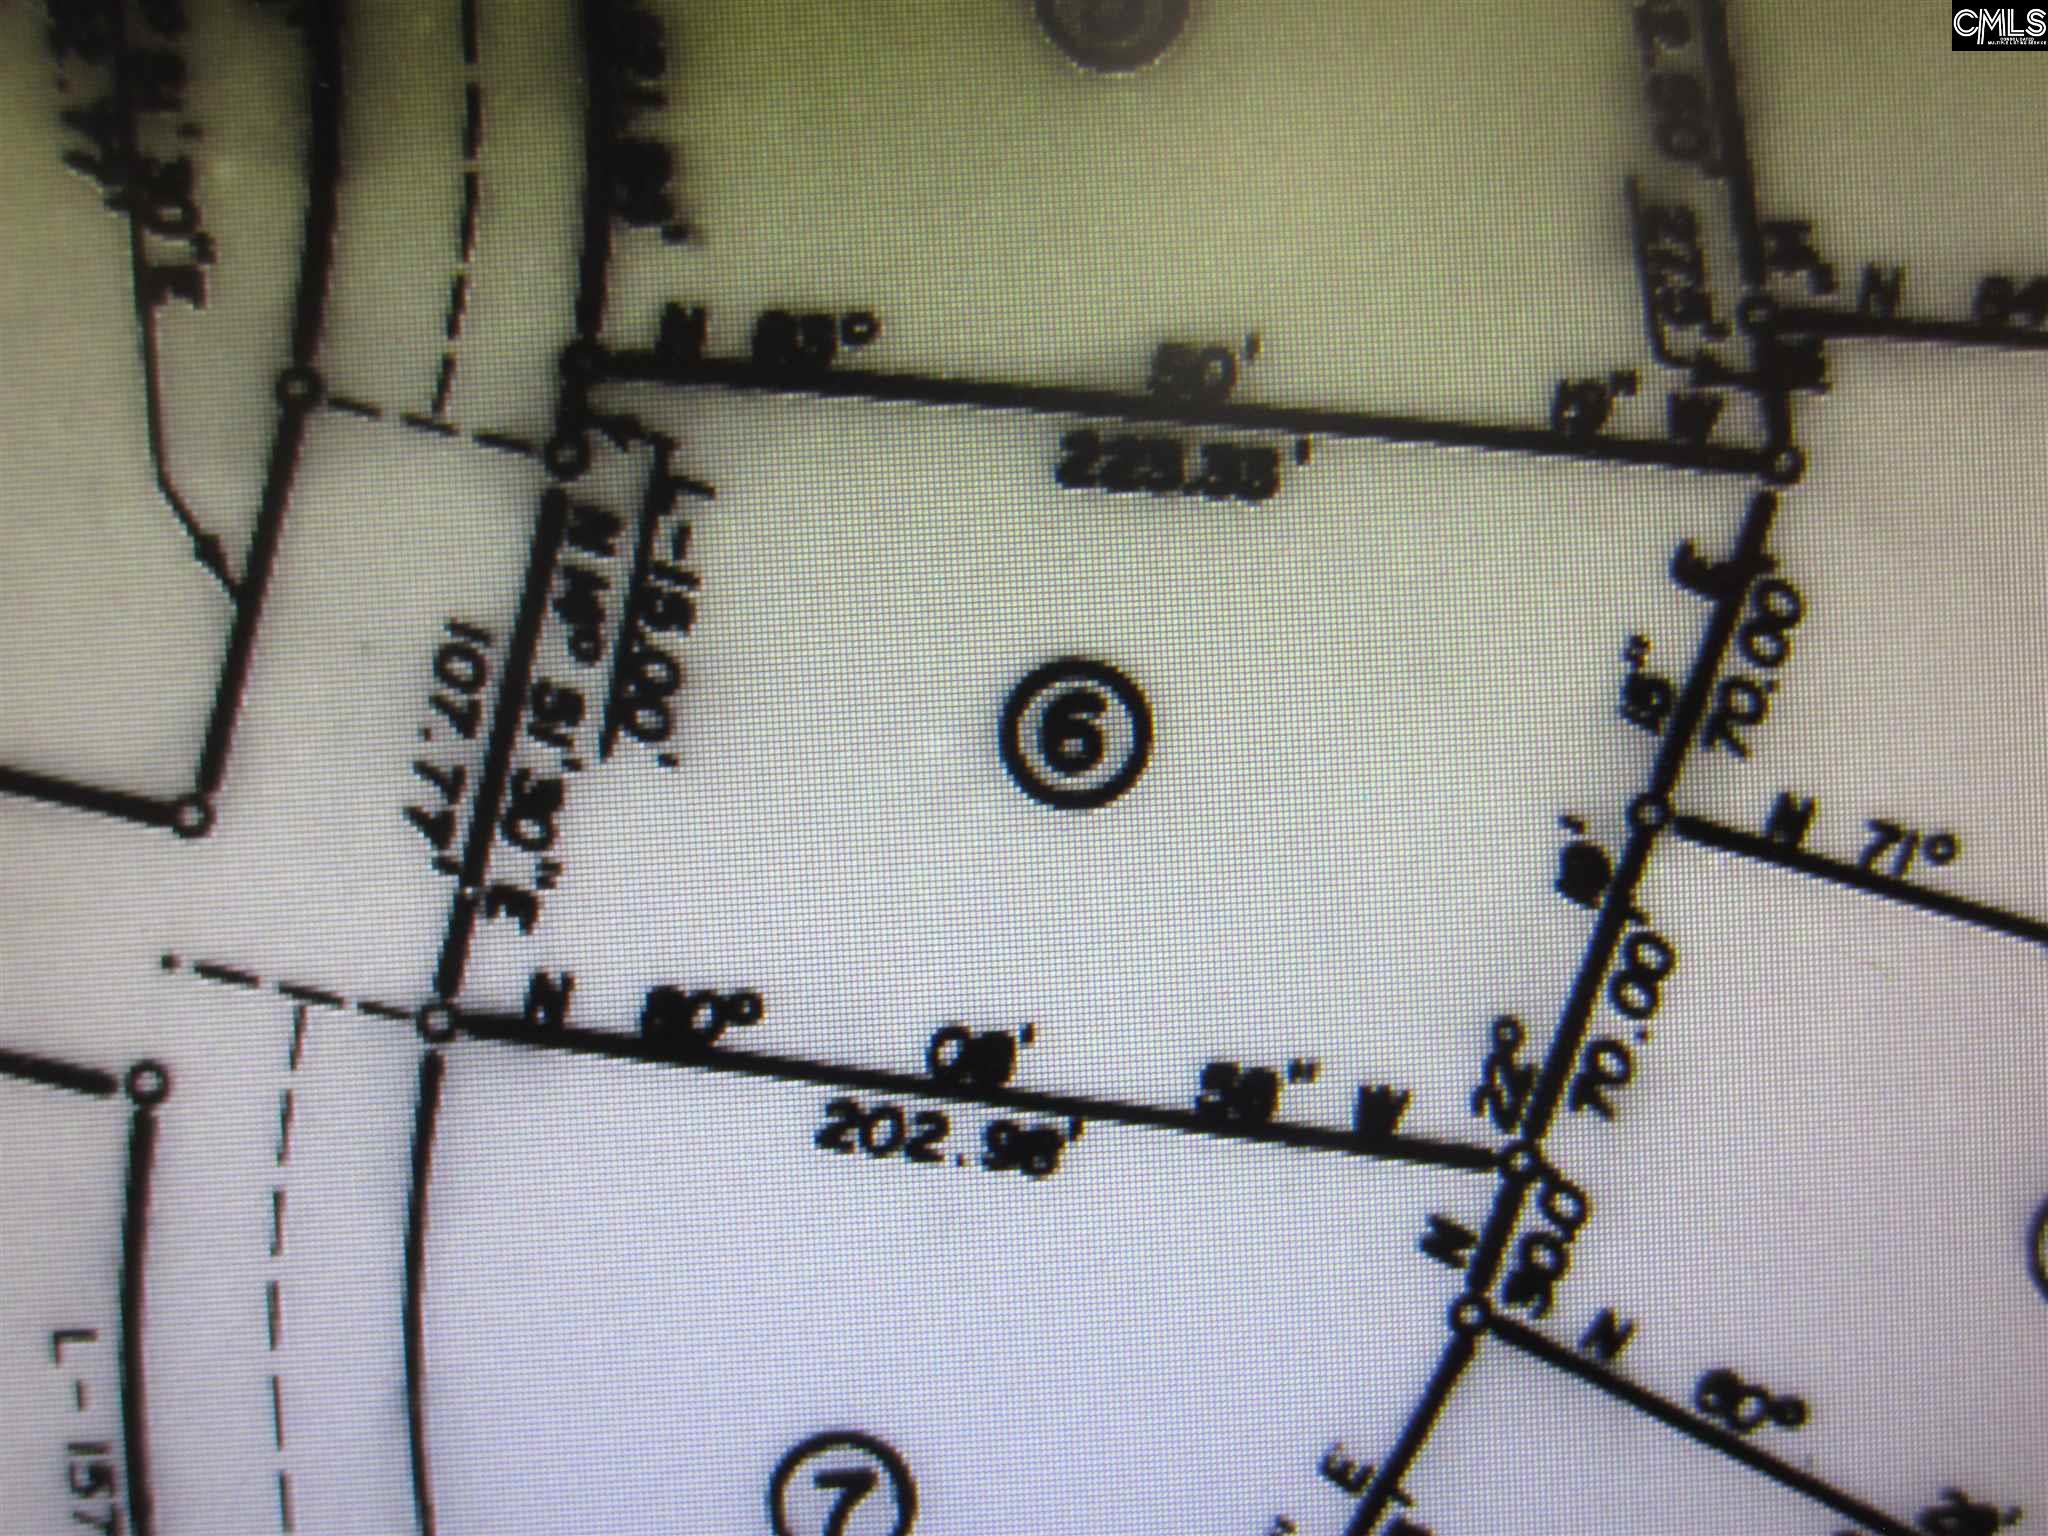 828 Woodgate Road Camden, SC 29020 451079